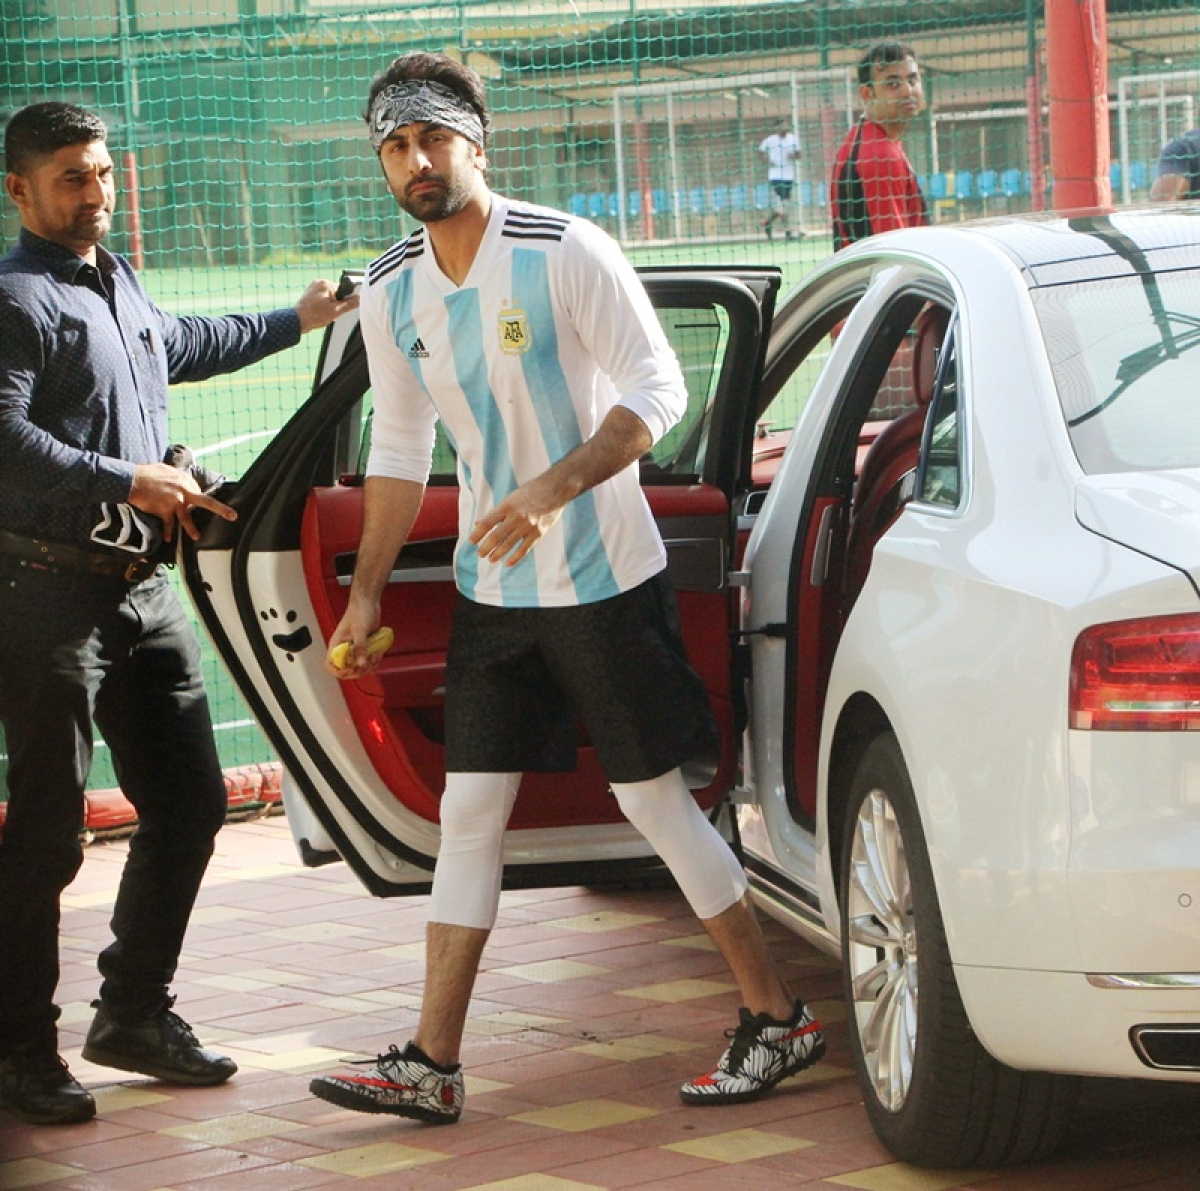 Basking in 'Sanju' glory, Ranbir Kapoor enjoys football with cousins Armaan, Aadar Jain; sporty pics